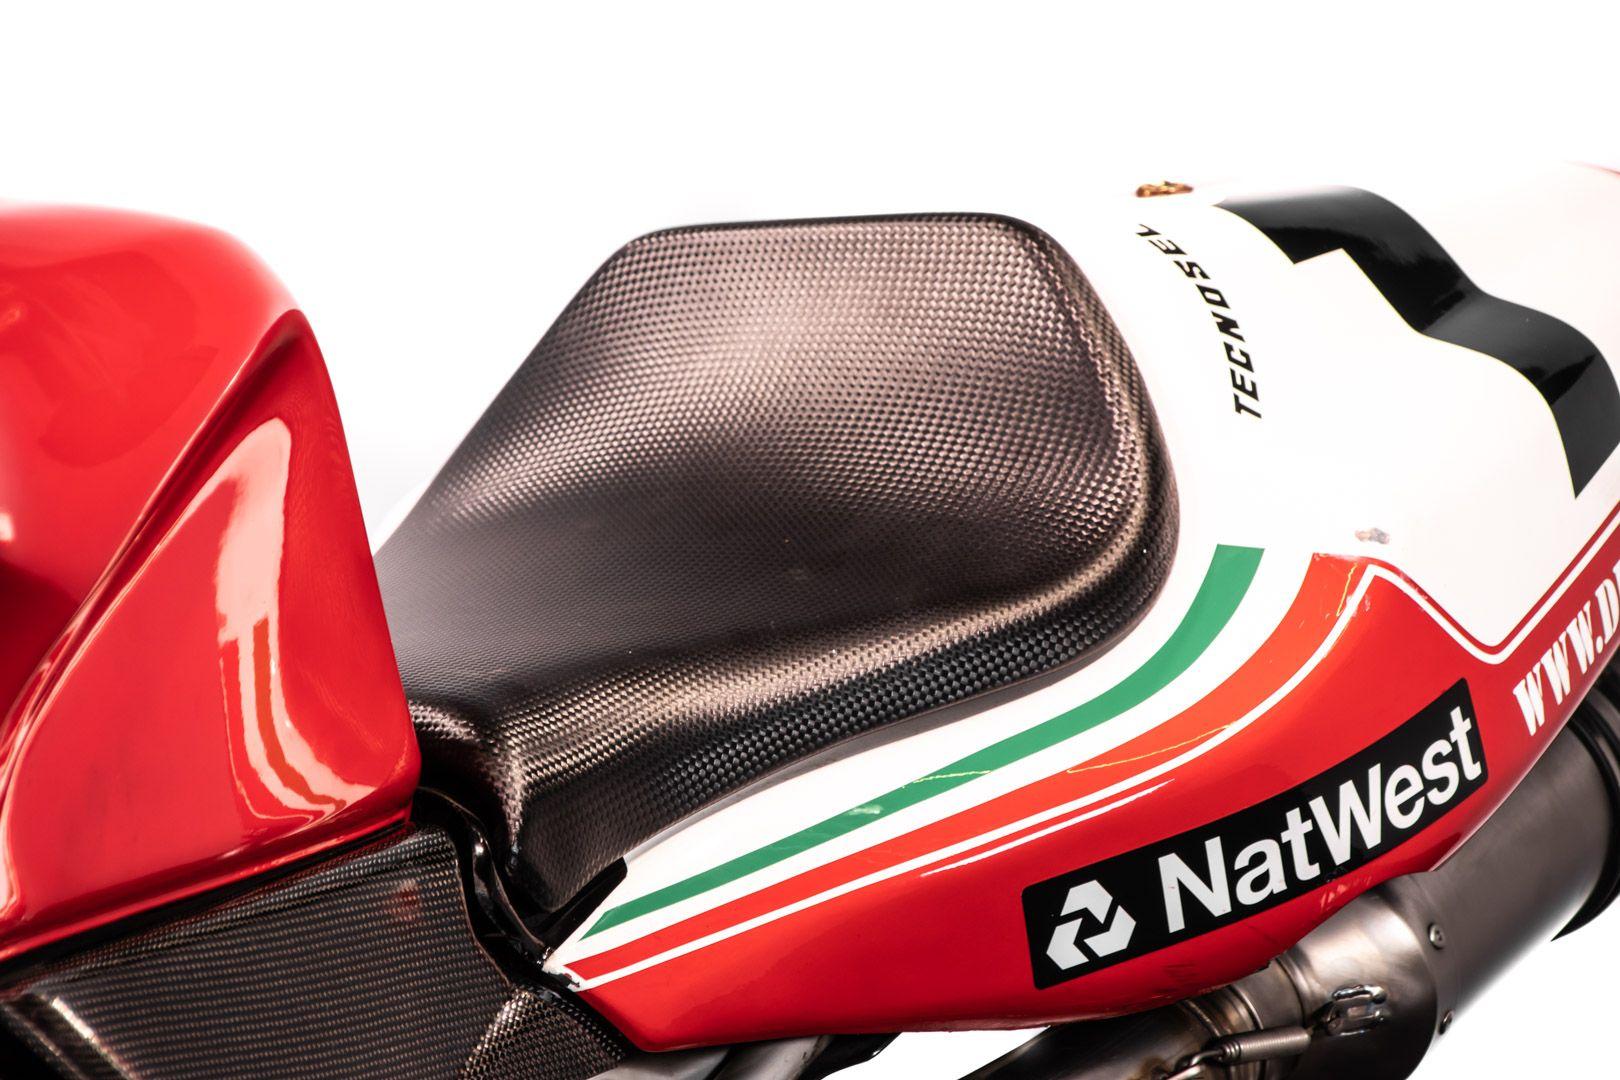 2008 Ducati 996 Fogarty Evocation 03/12 84227